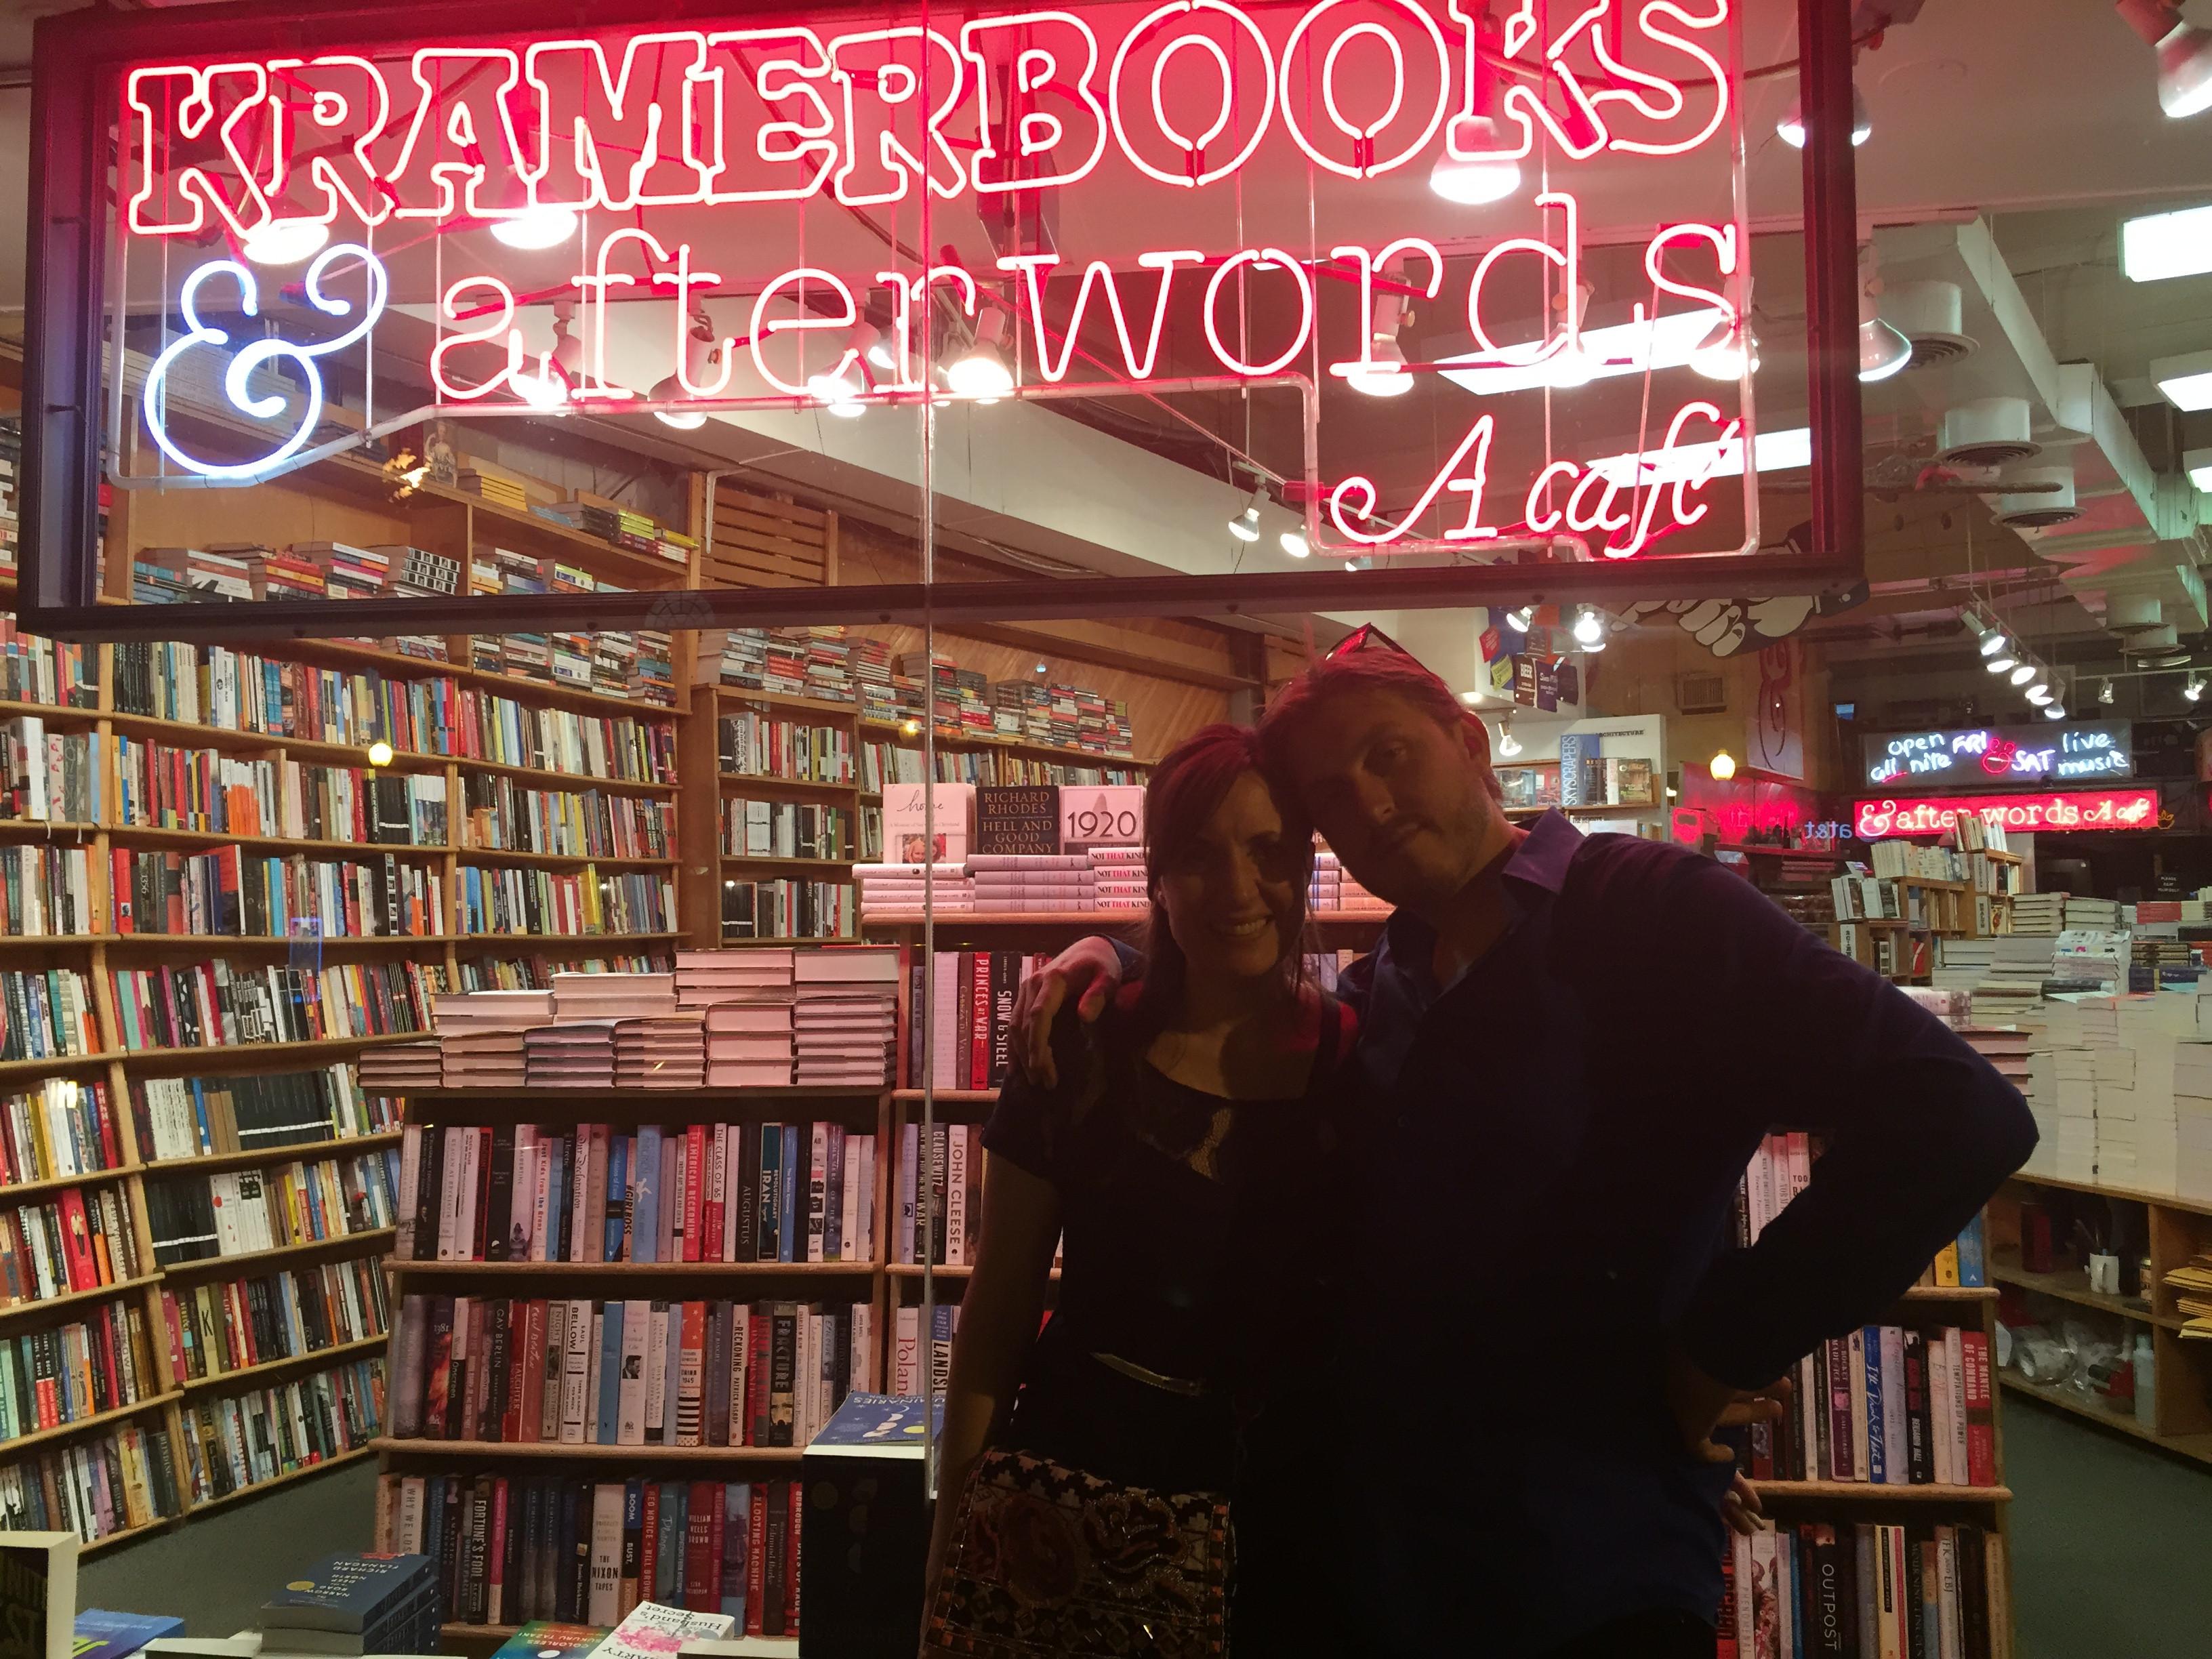 Hannah Papp KramerBooks17